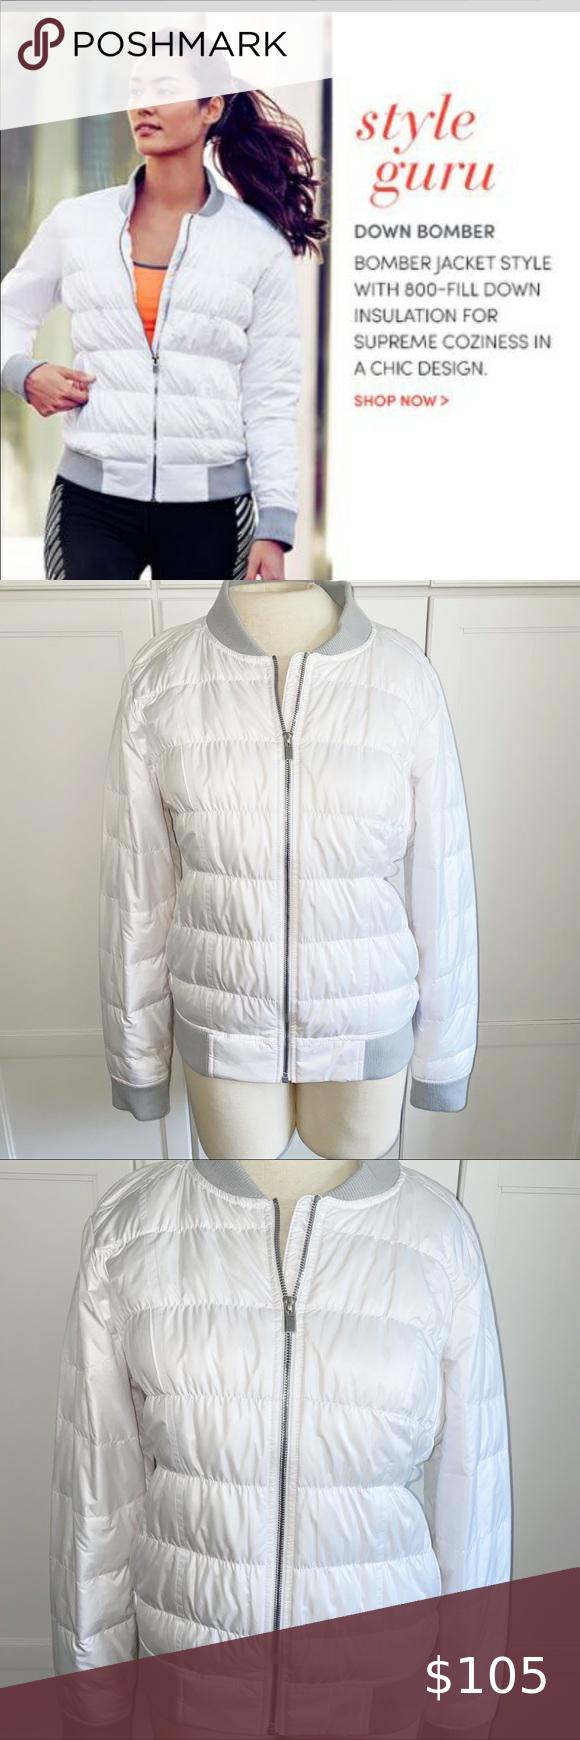 Athleta White Down Bomber Jacket Athleta White Down Bomber Jacket Bomber Style Jacket Gets Down With 800 Fill Water R Bomber Jacket Jackets Clothes Design [ 1740 x 580 Pixel ]